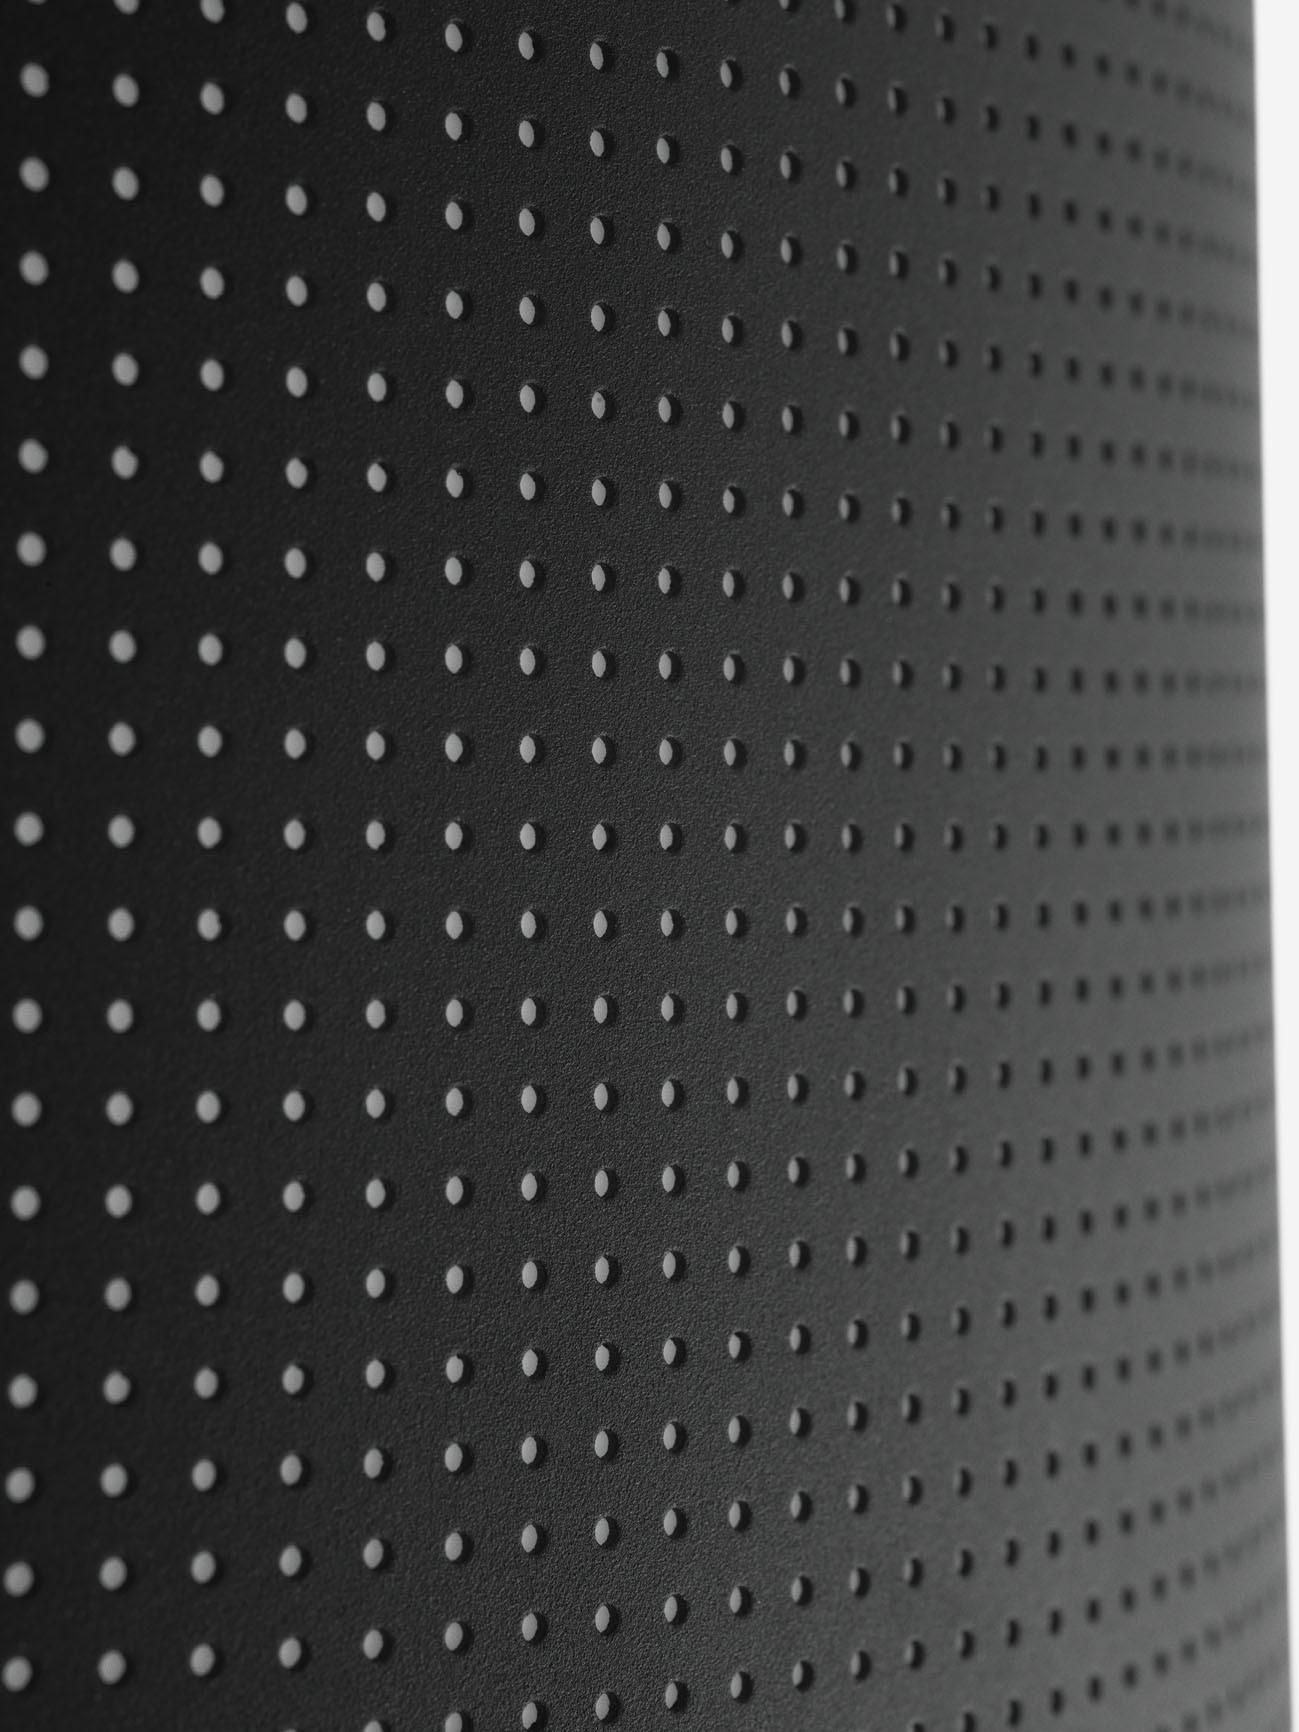 vipp Wall Lamp VIPP522, 52204EU, 5705953004758